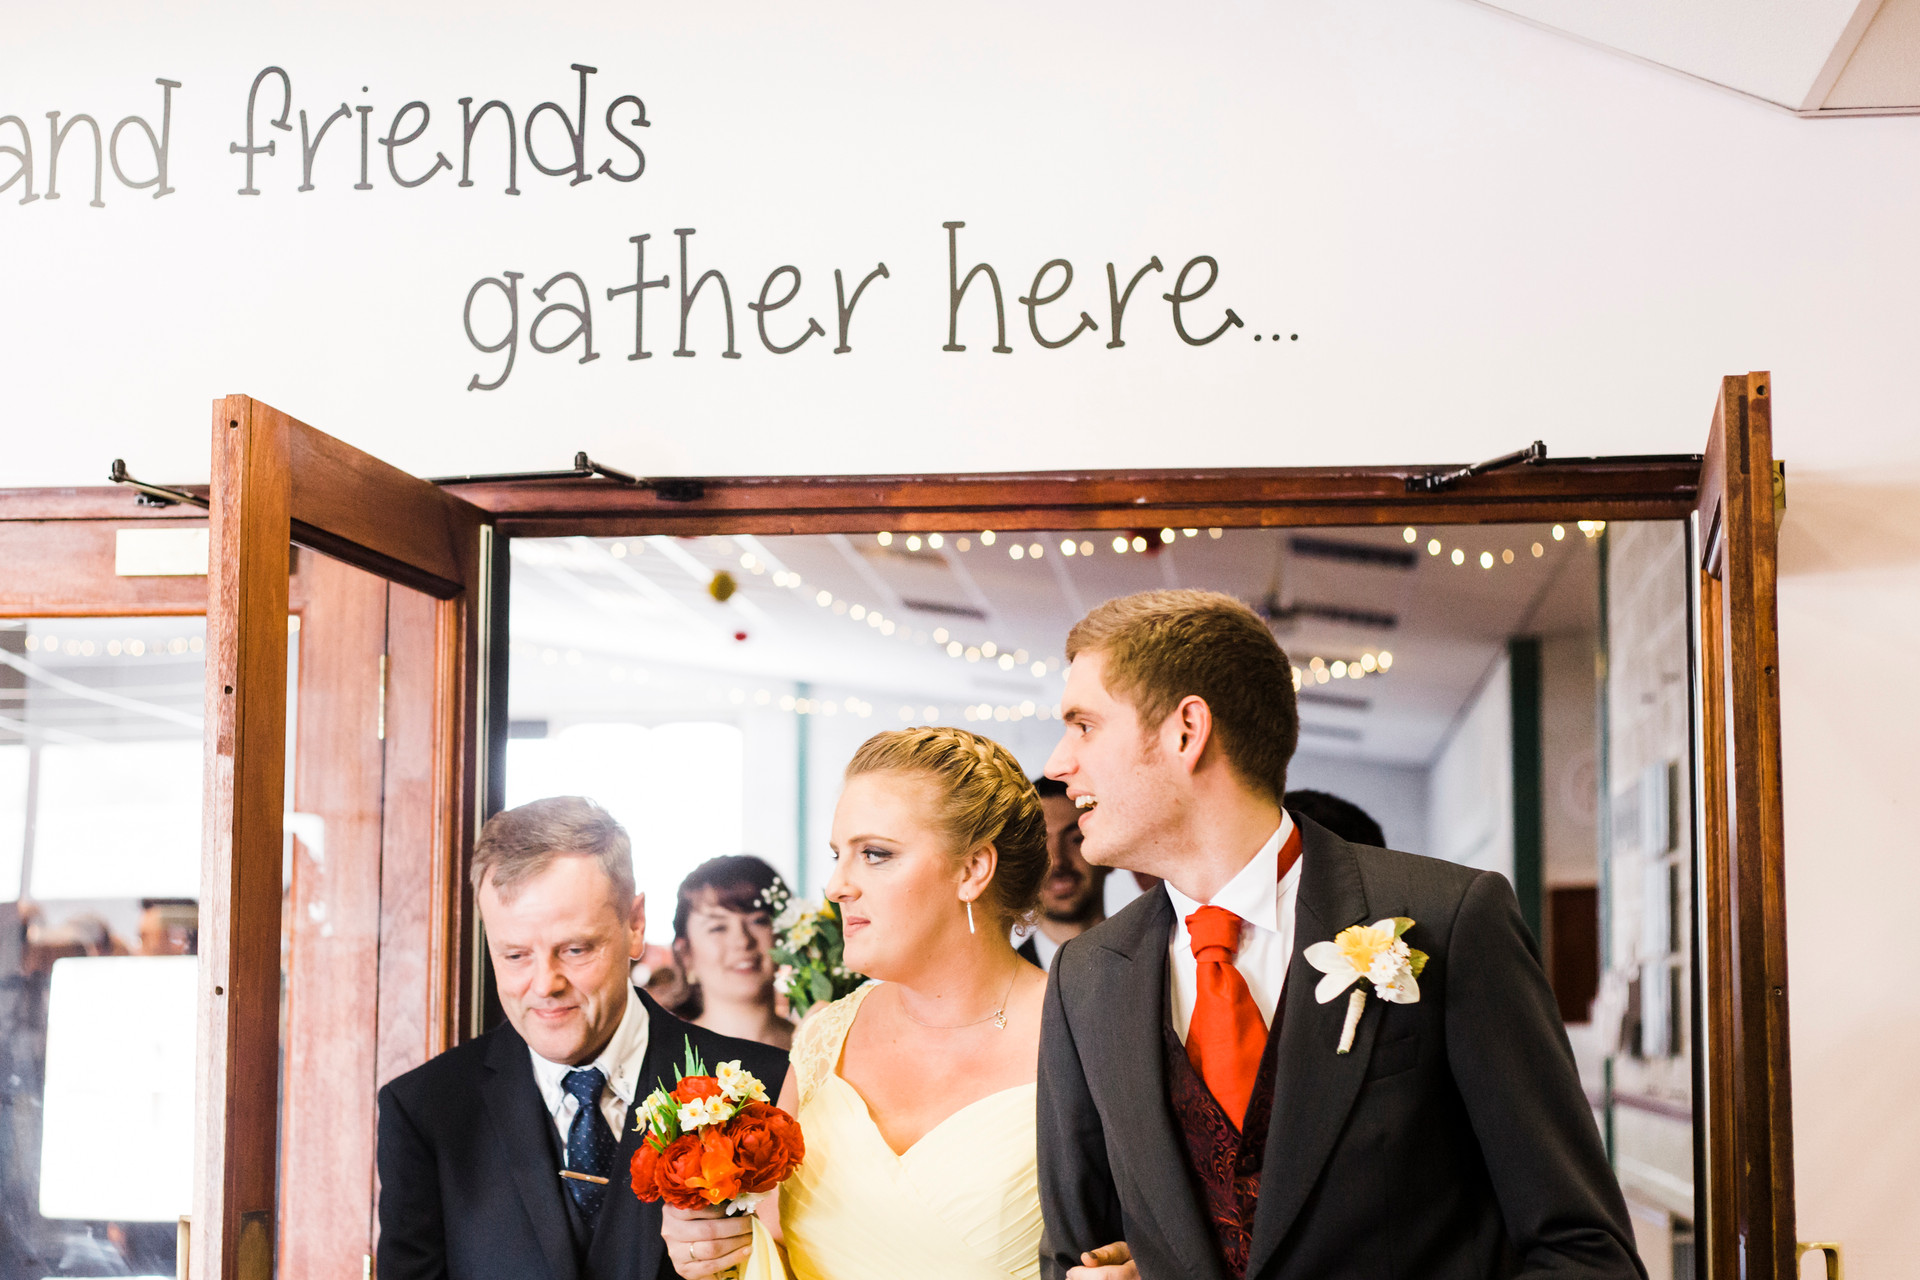 honouring Jesus in your wedding